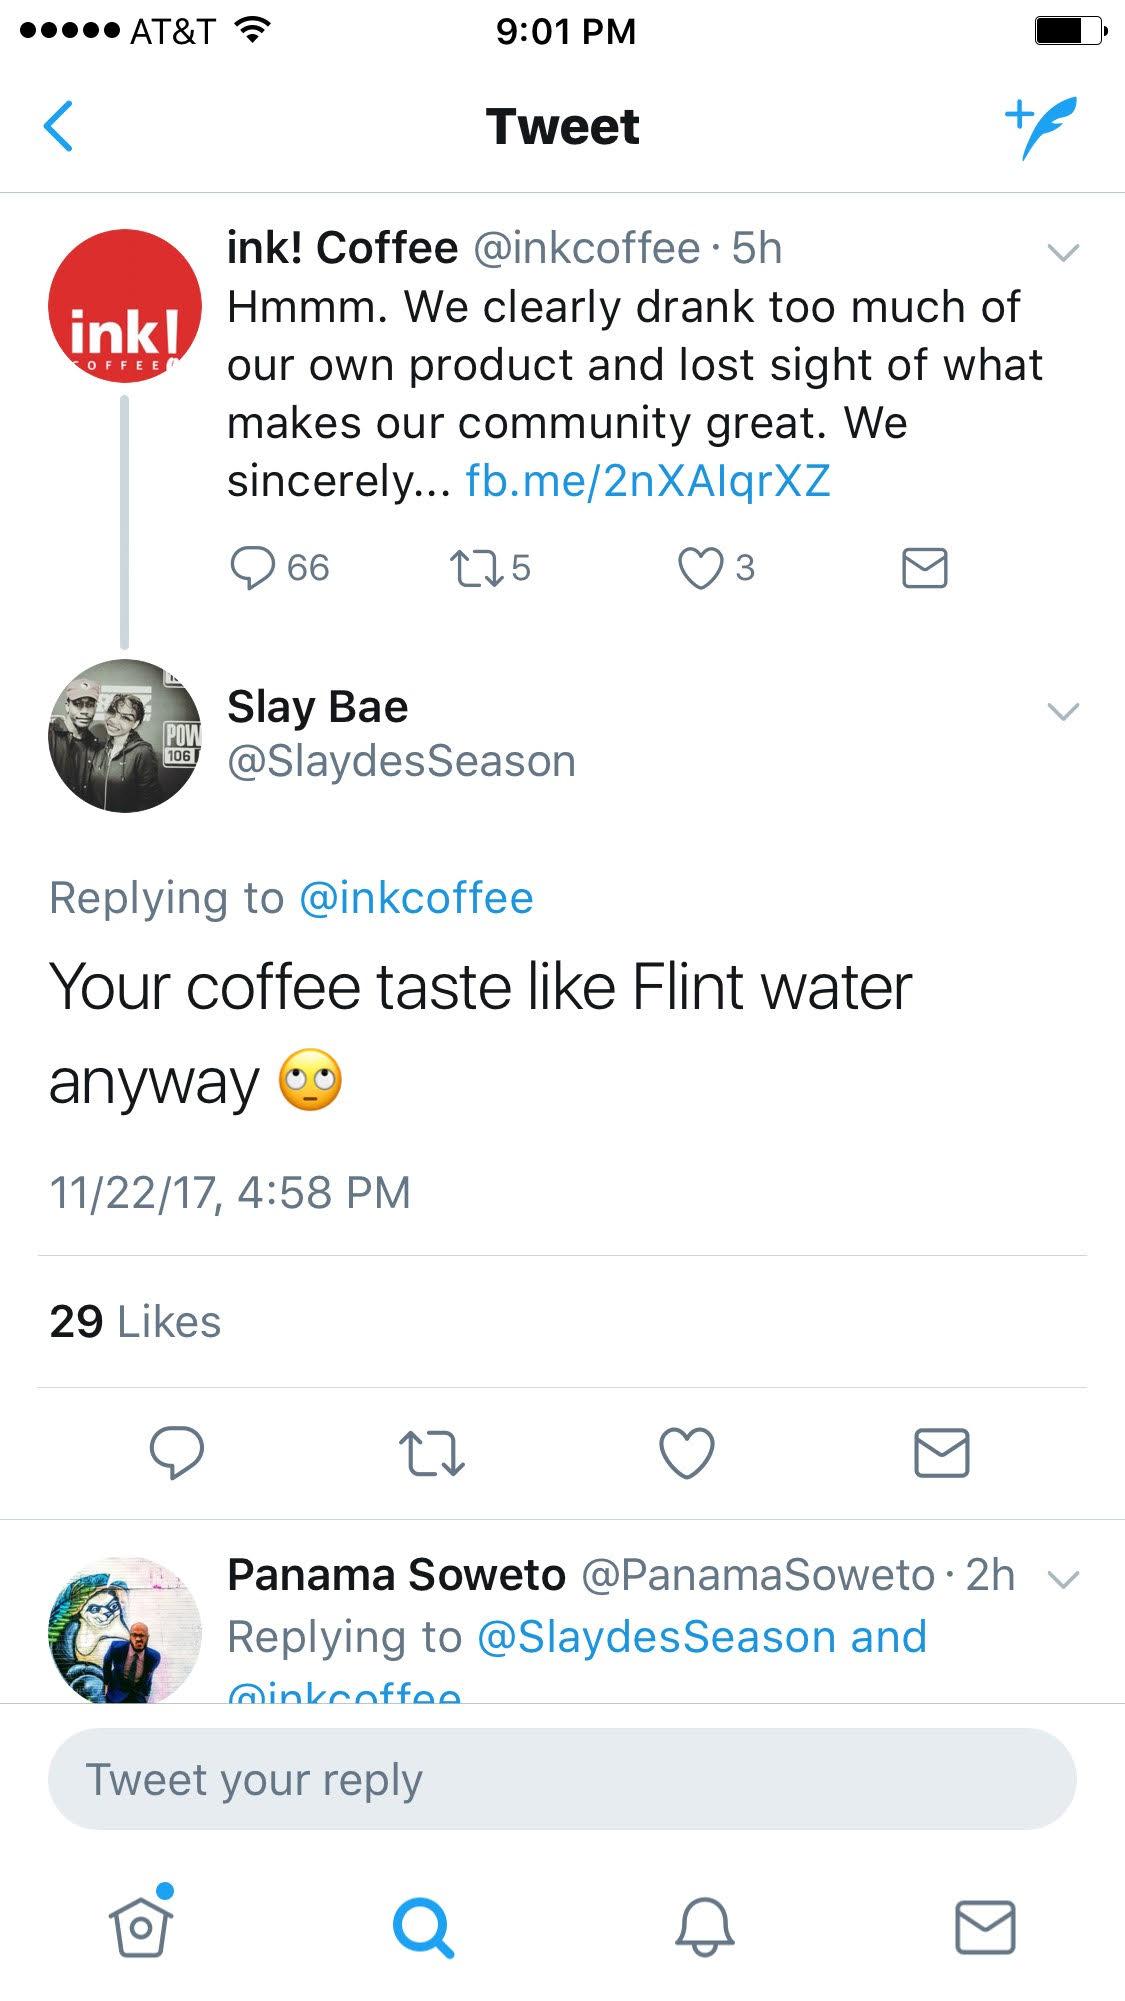 Ink Coffee Twitter response